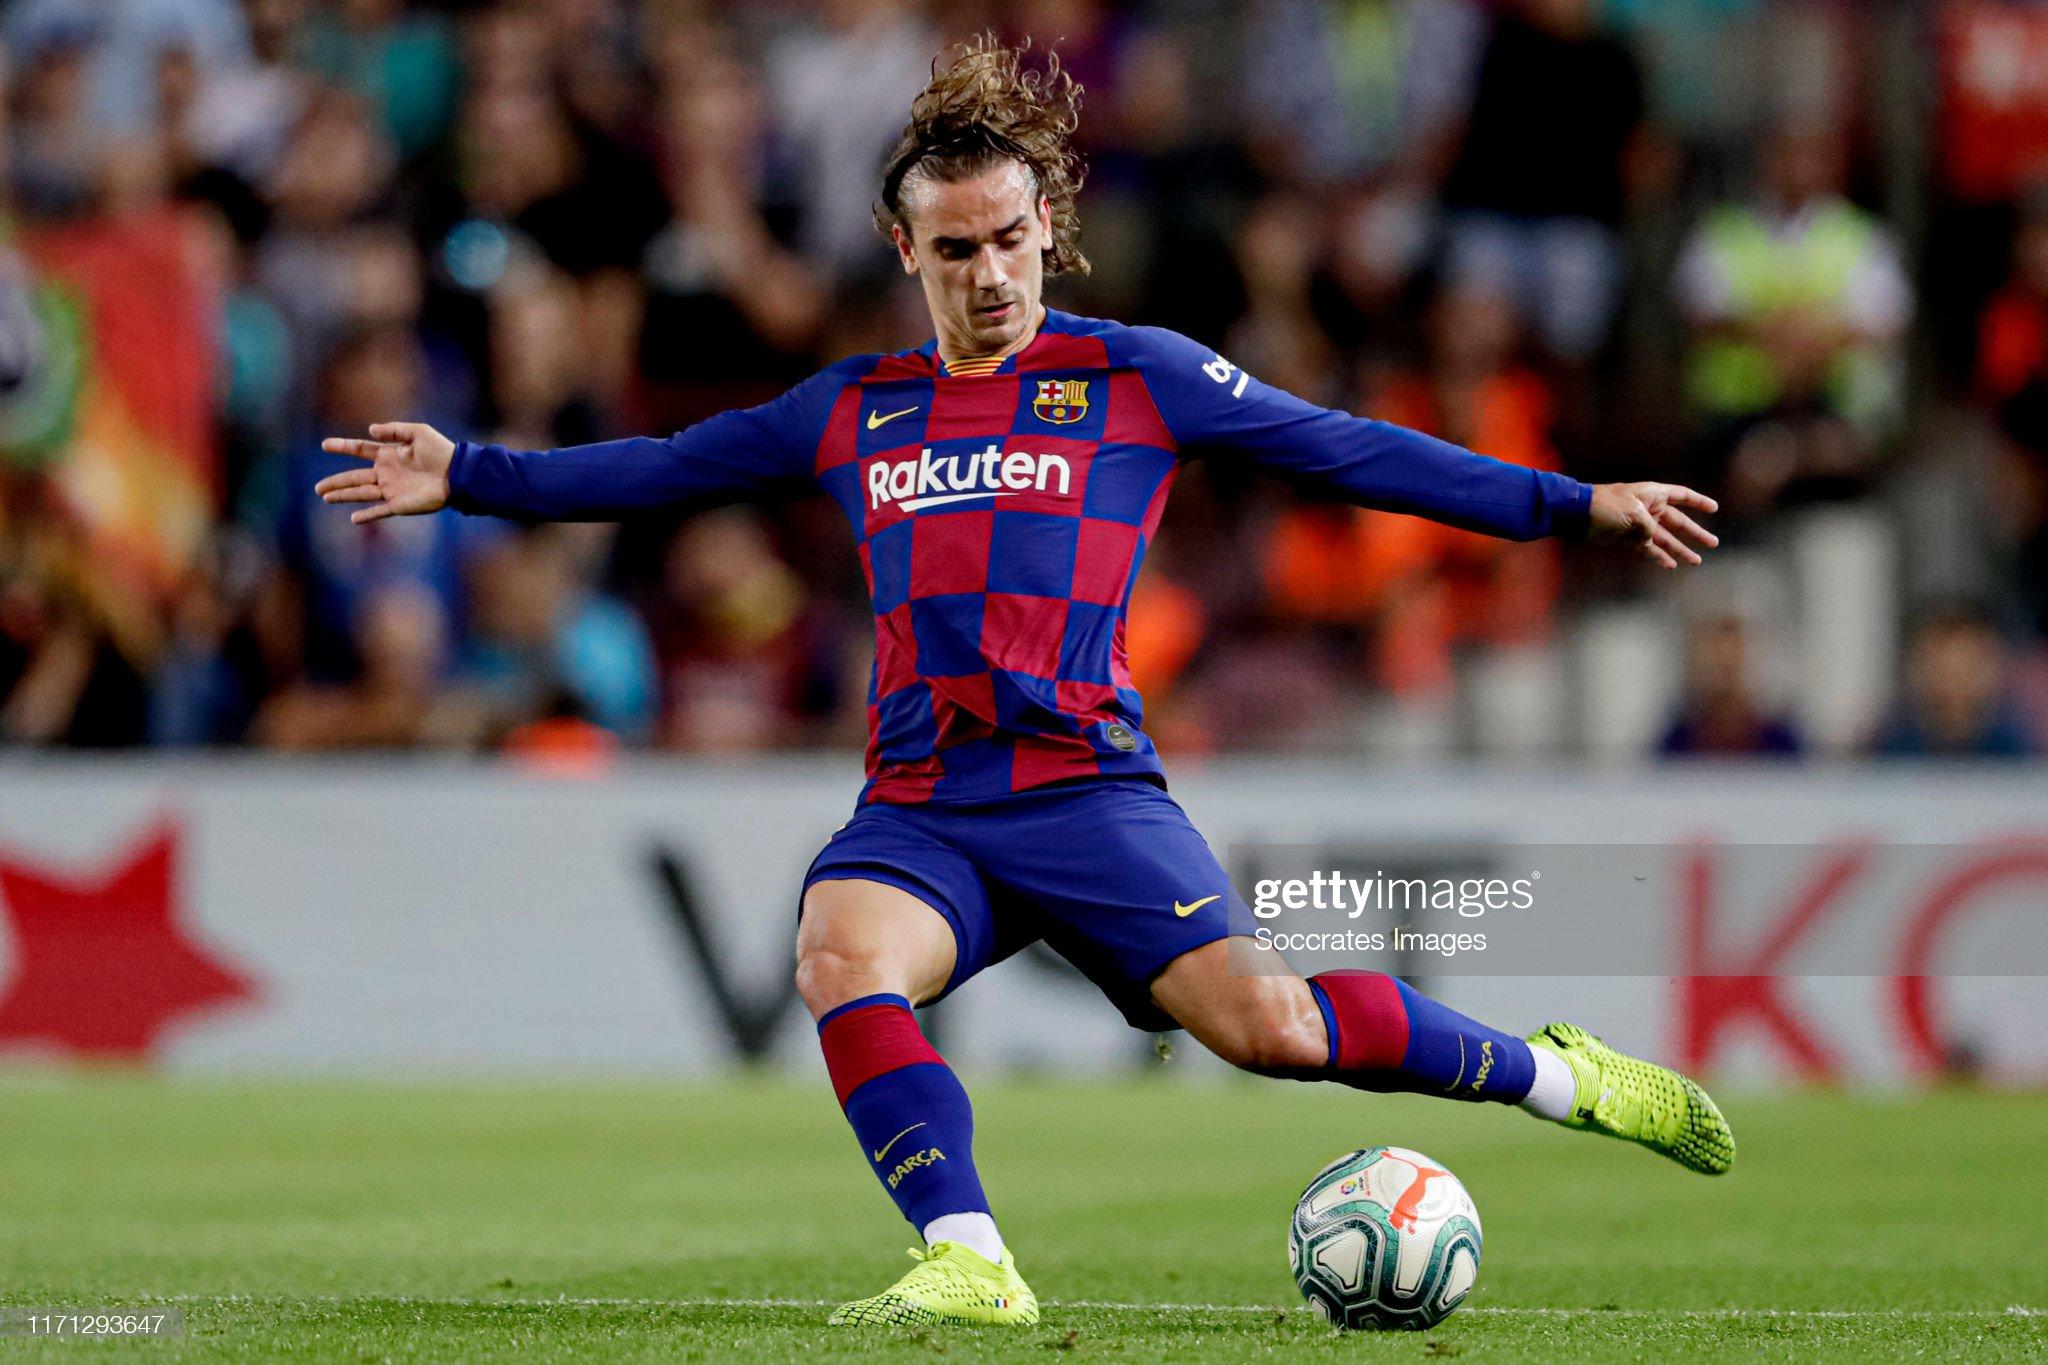 صور مباراة : برشلونة - فياريال 2-1 ( 24-09-2019 )  Antoine-griezmann-of-fc-barcelona-during-the-la-liga-santander-match-picture-id1171293647?s=2048x2048